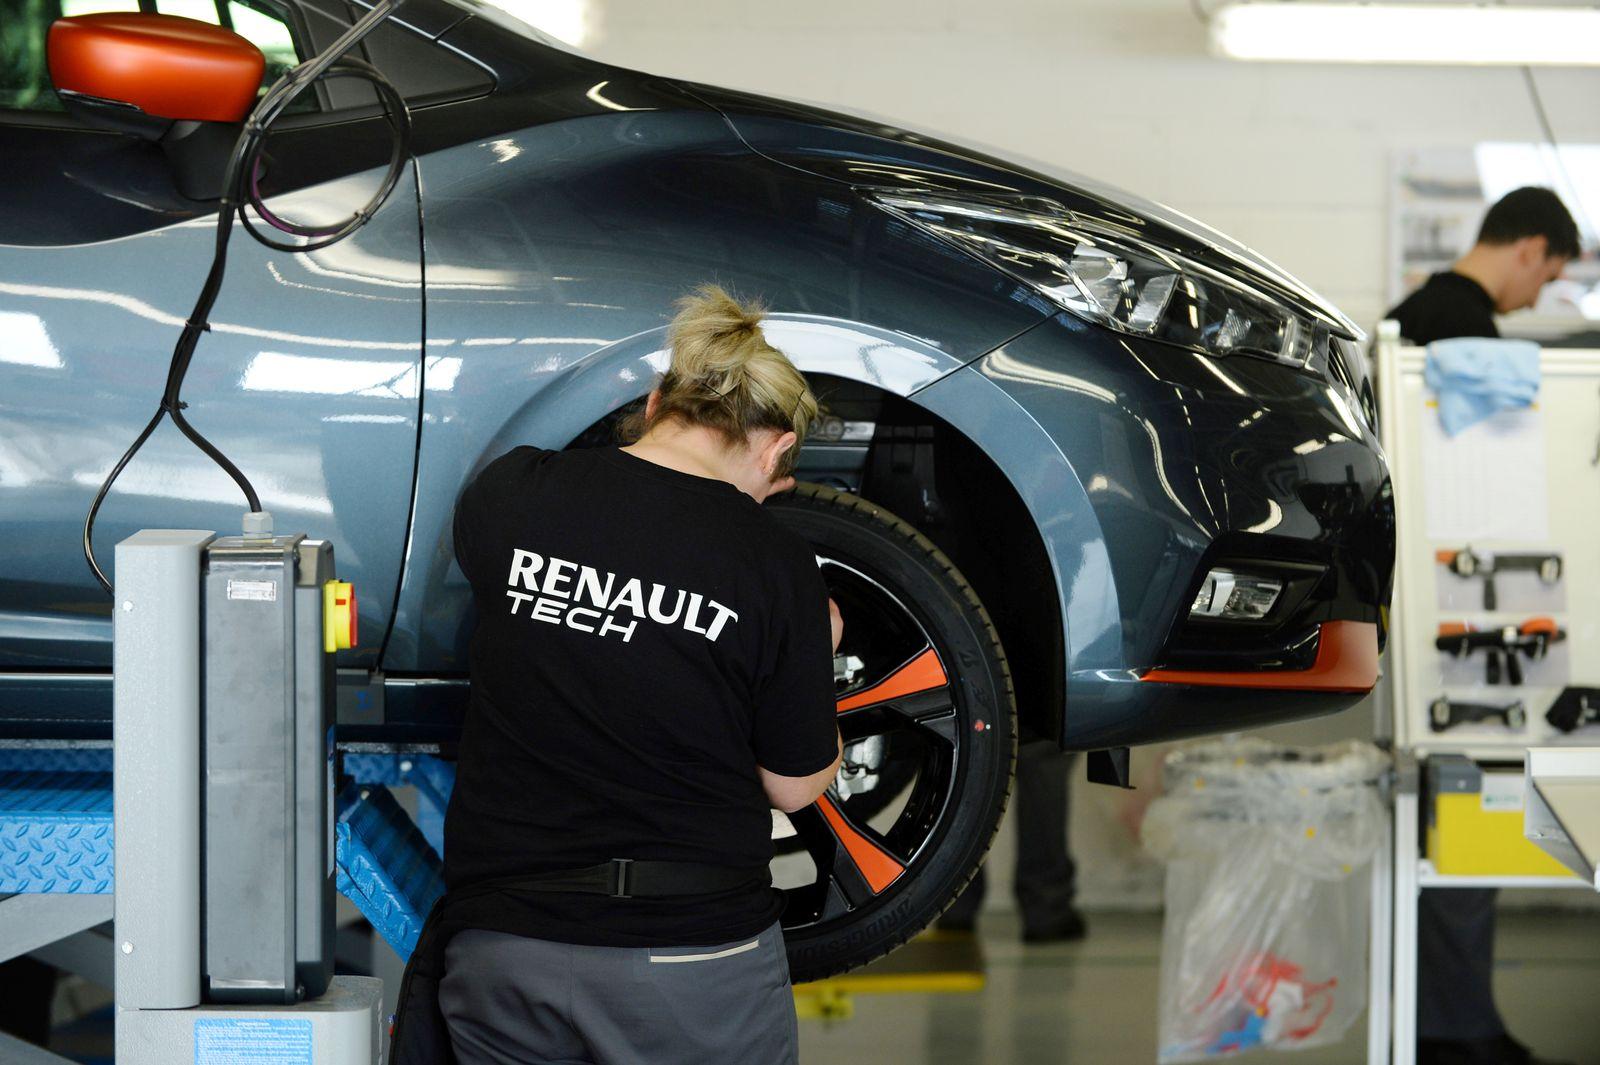 Werkstatt / Renault